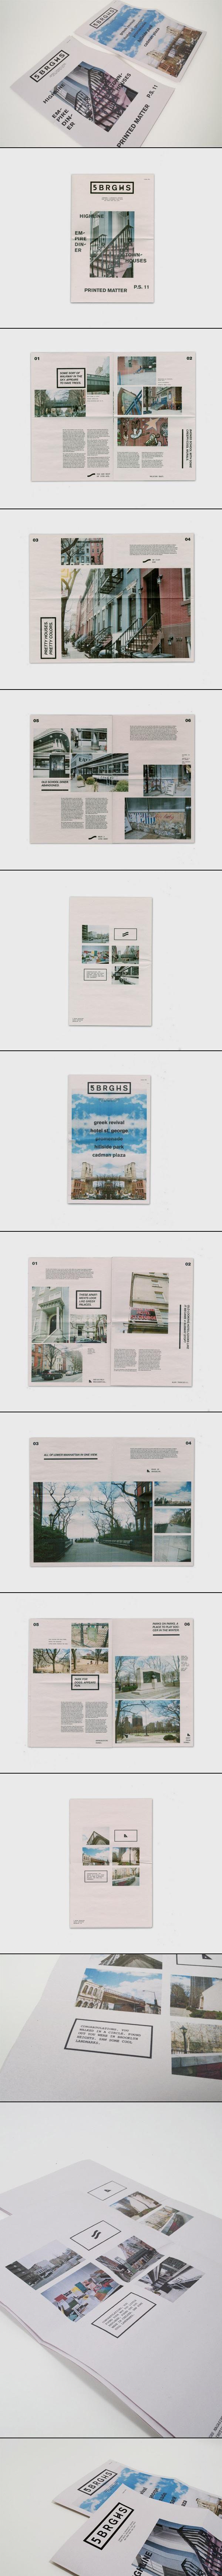 http://www.behance.net/gallery/5-BRGHS-Magazine/7807121